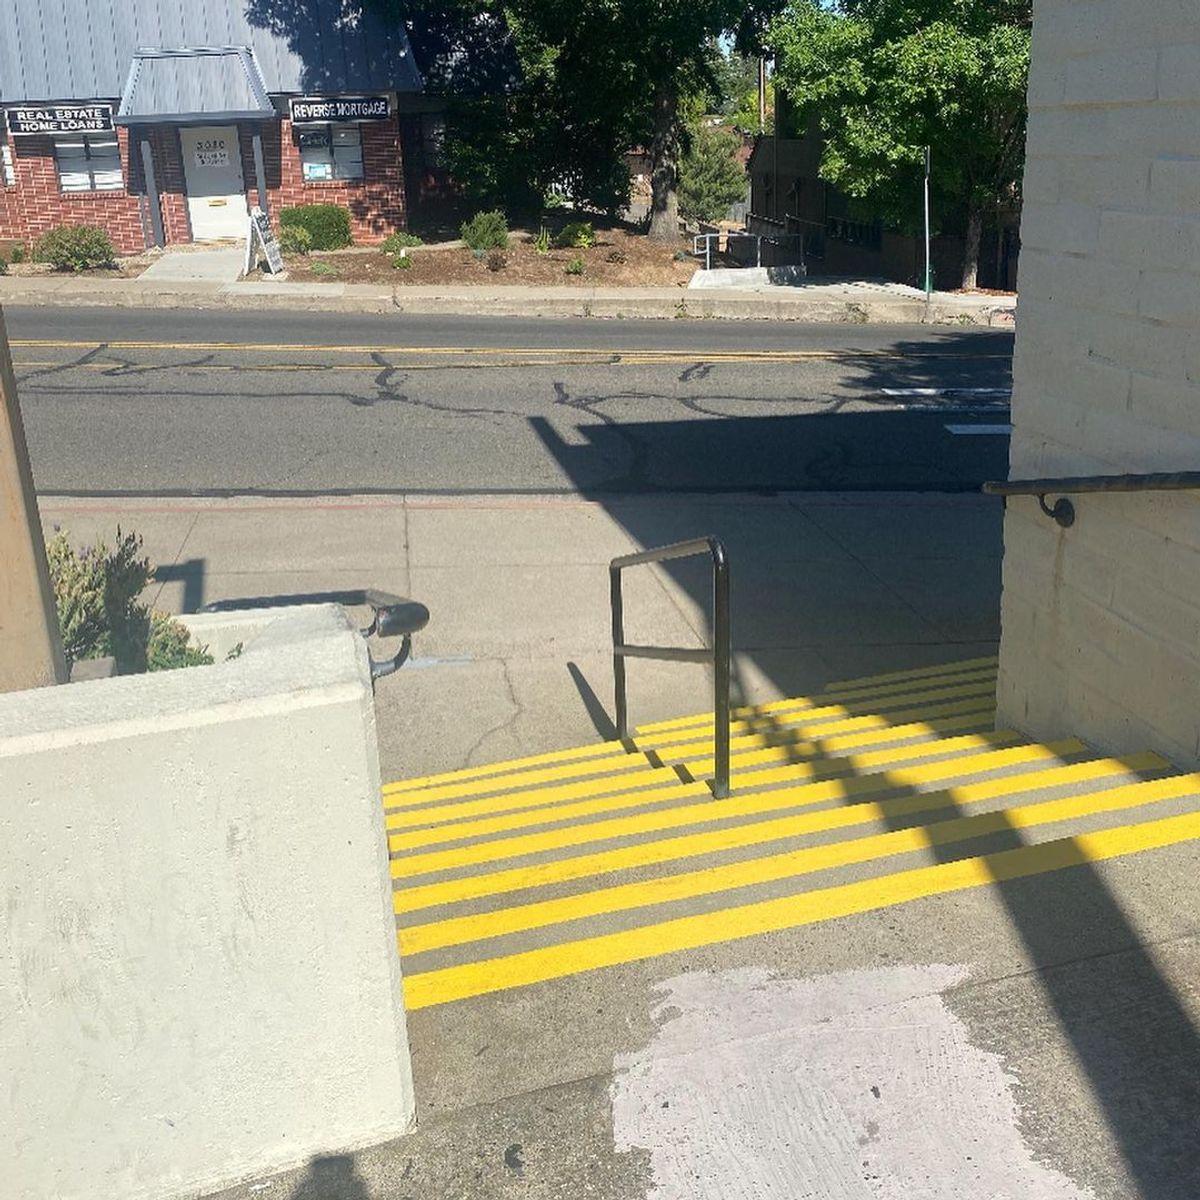 Image for skate spot Sacramento St - Gap To Rail